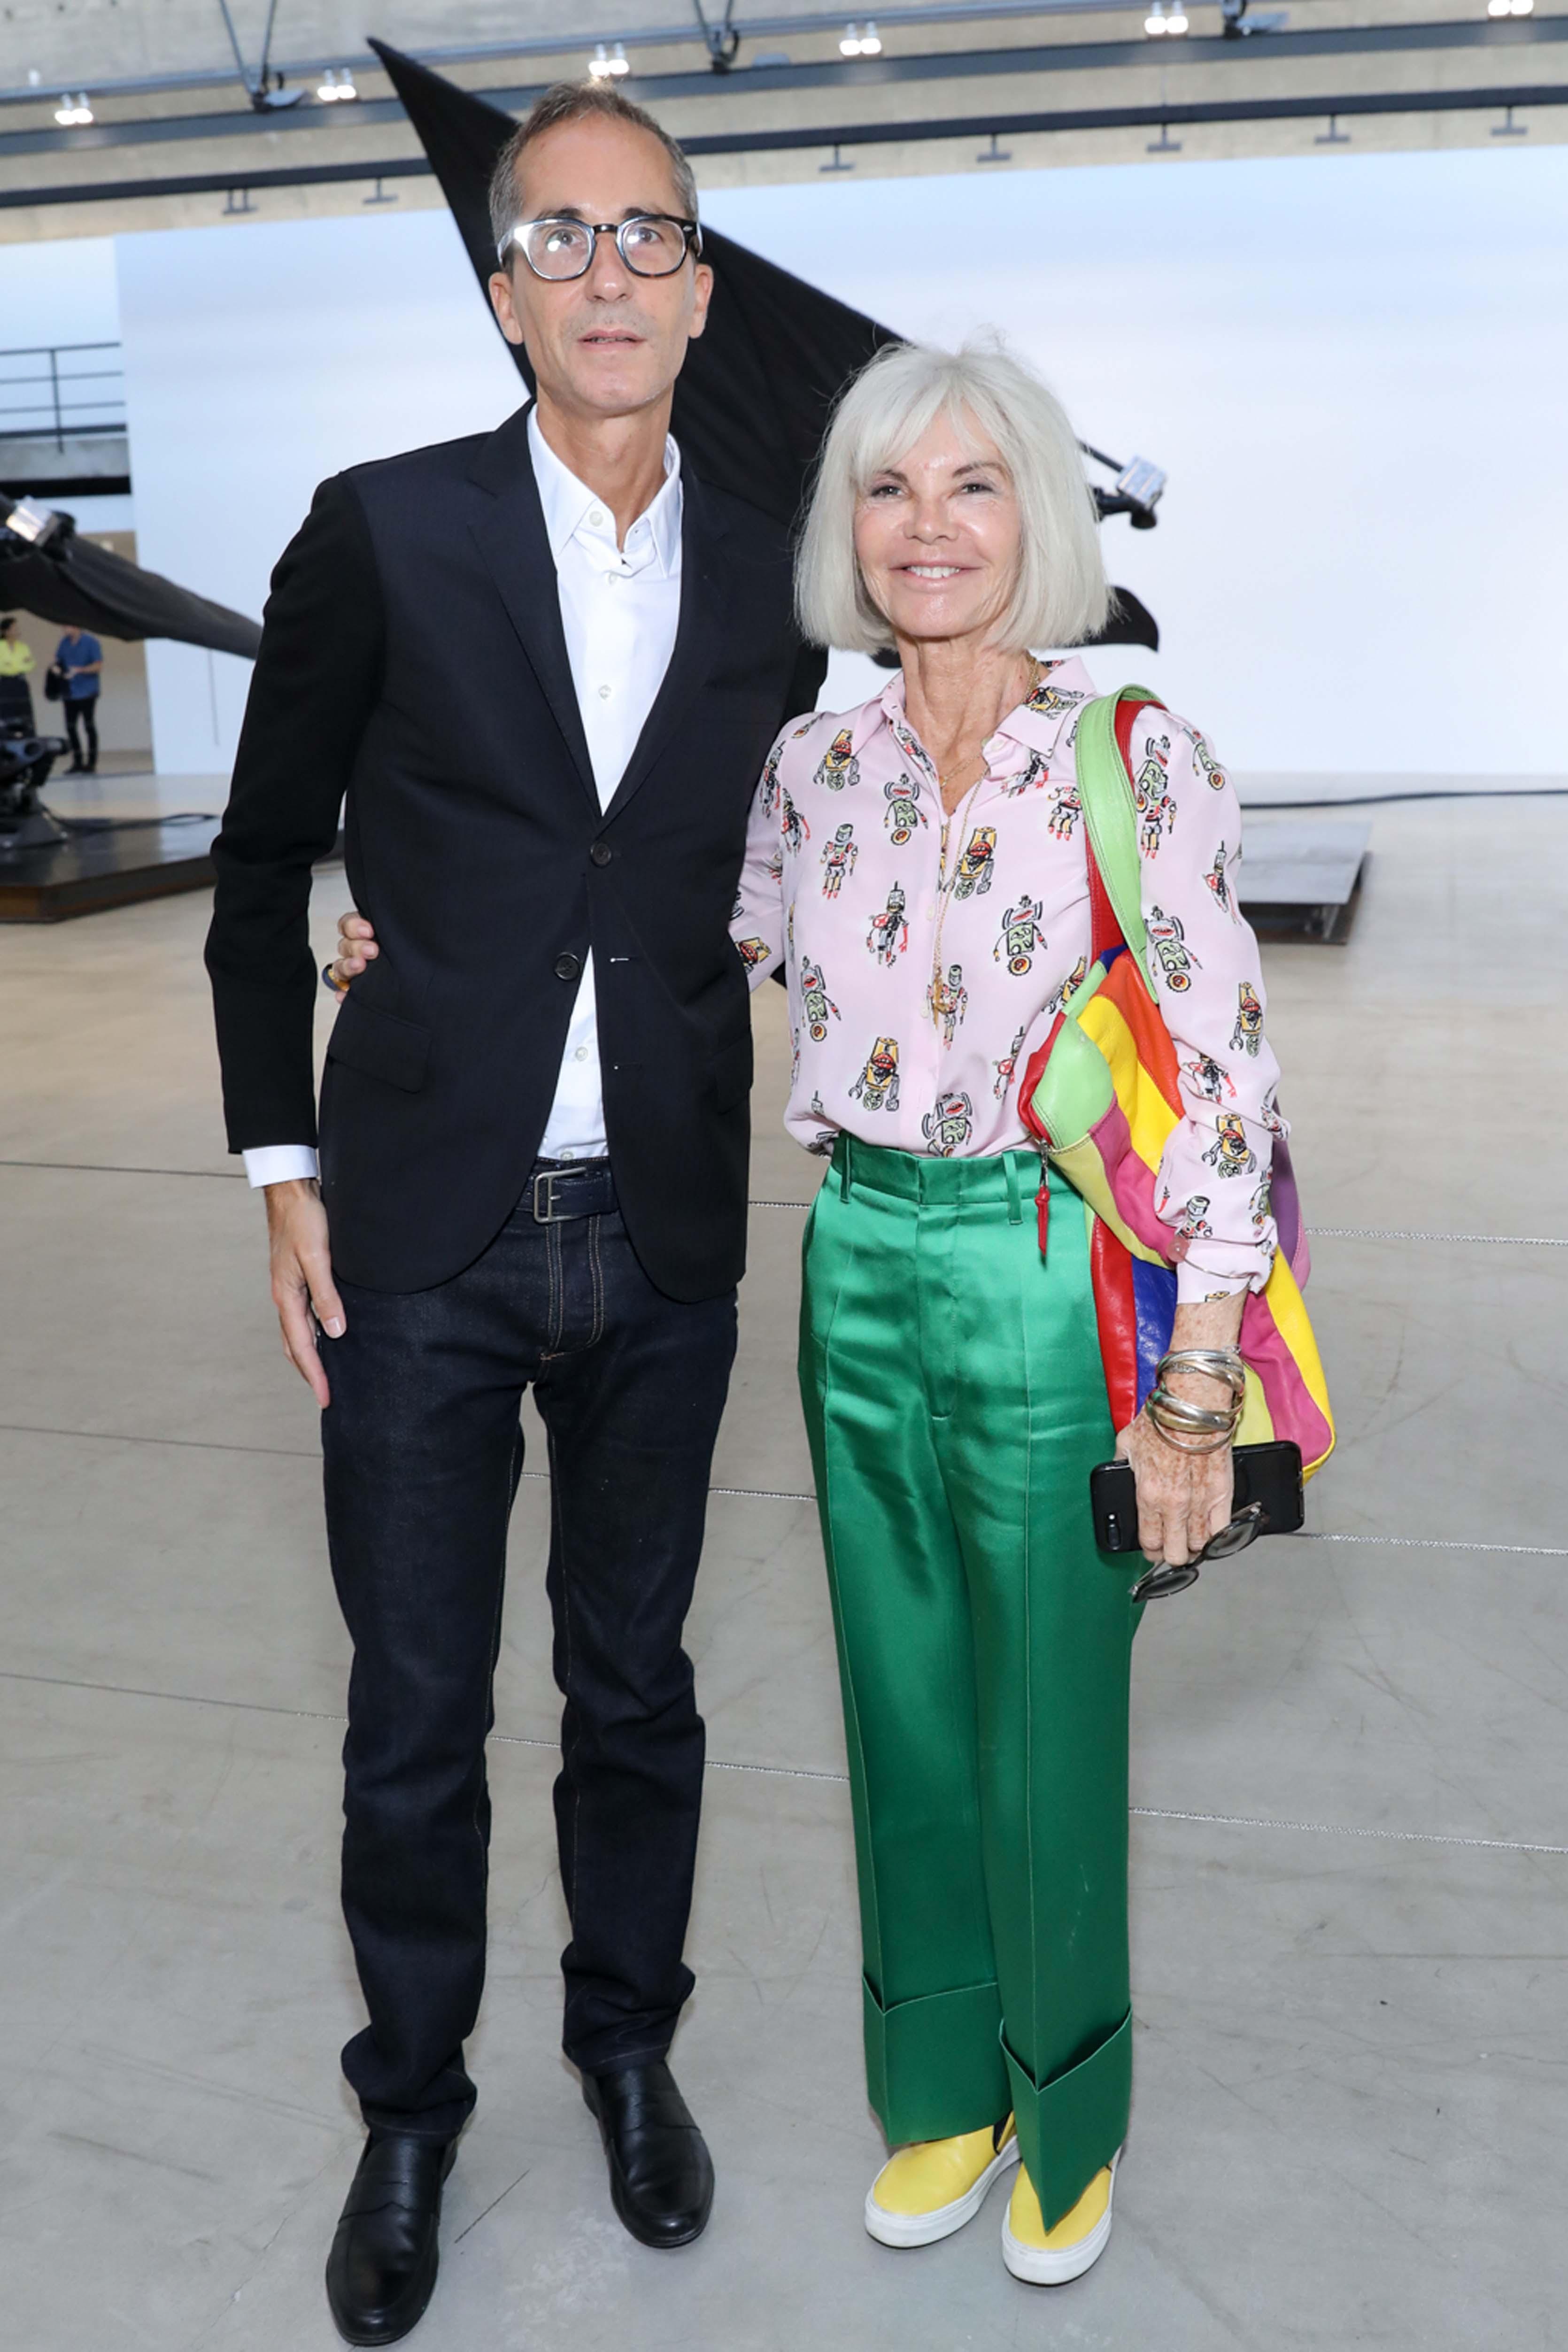 Hervé Mikaeloff et Astrid de T'serclaes